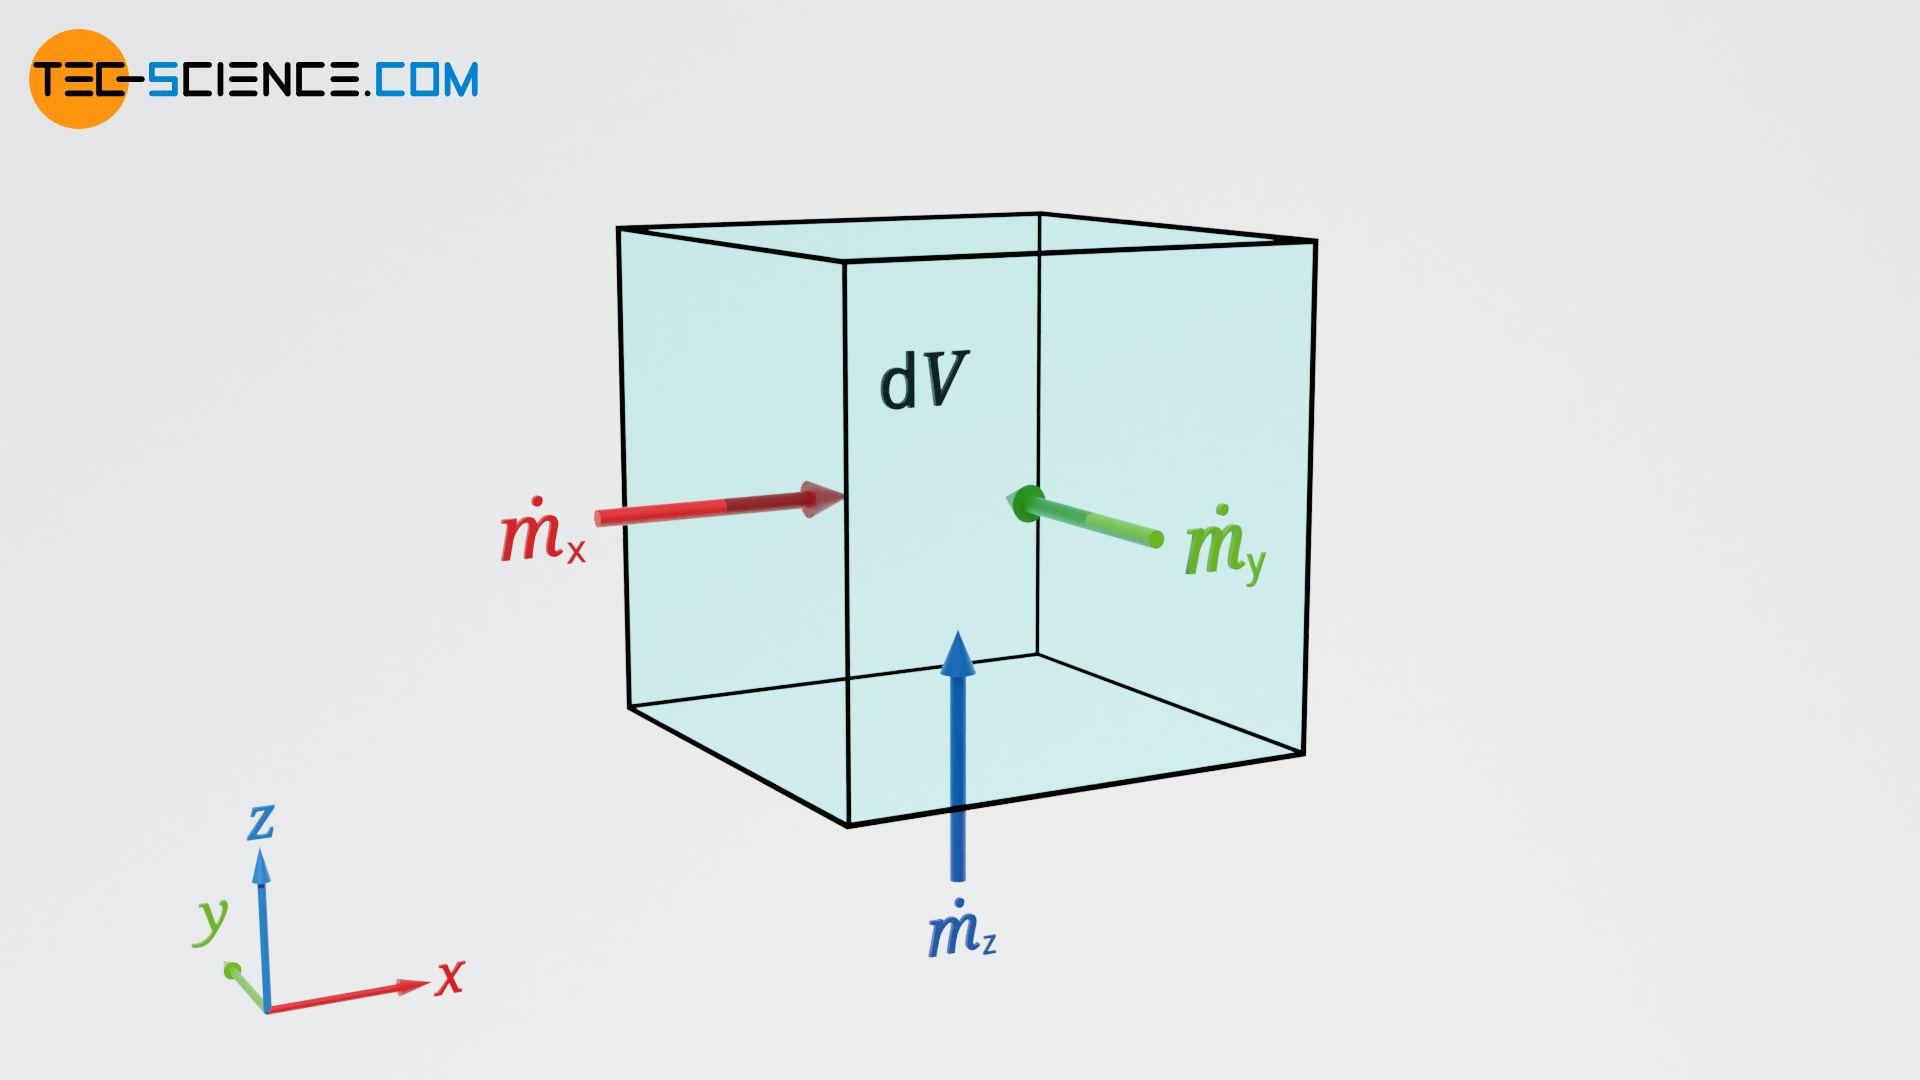 Mass flows across the boundaries of a volume element